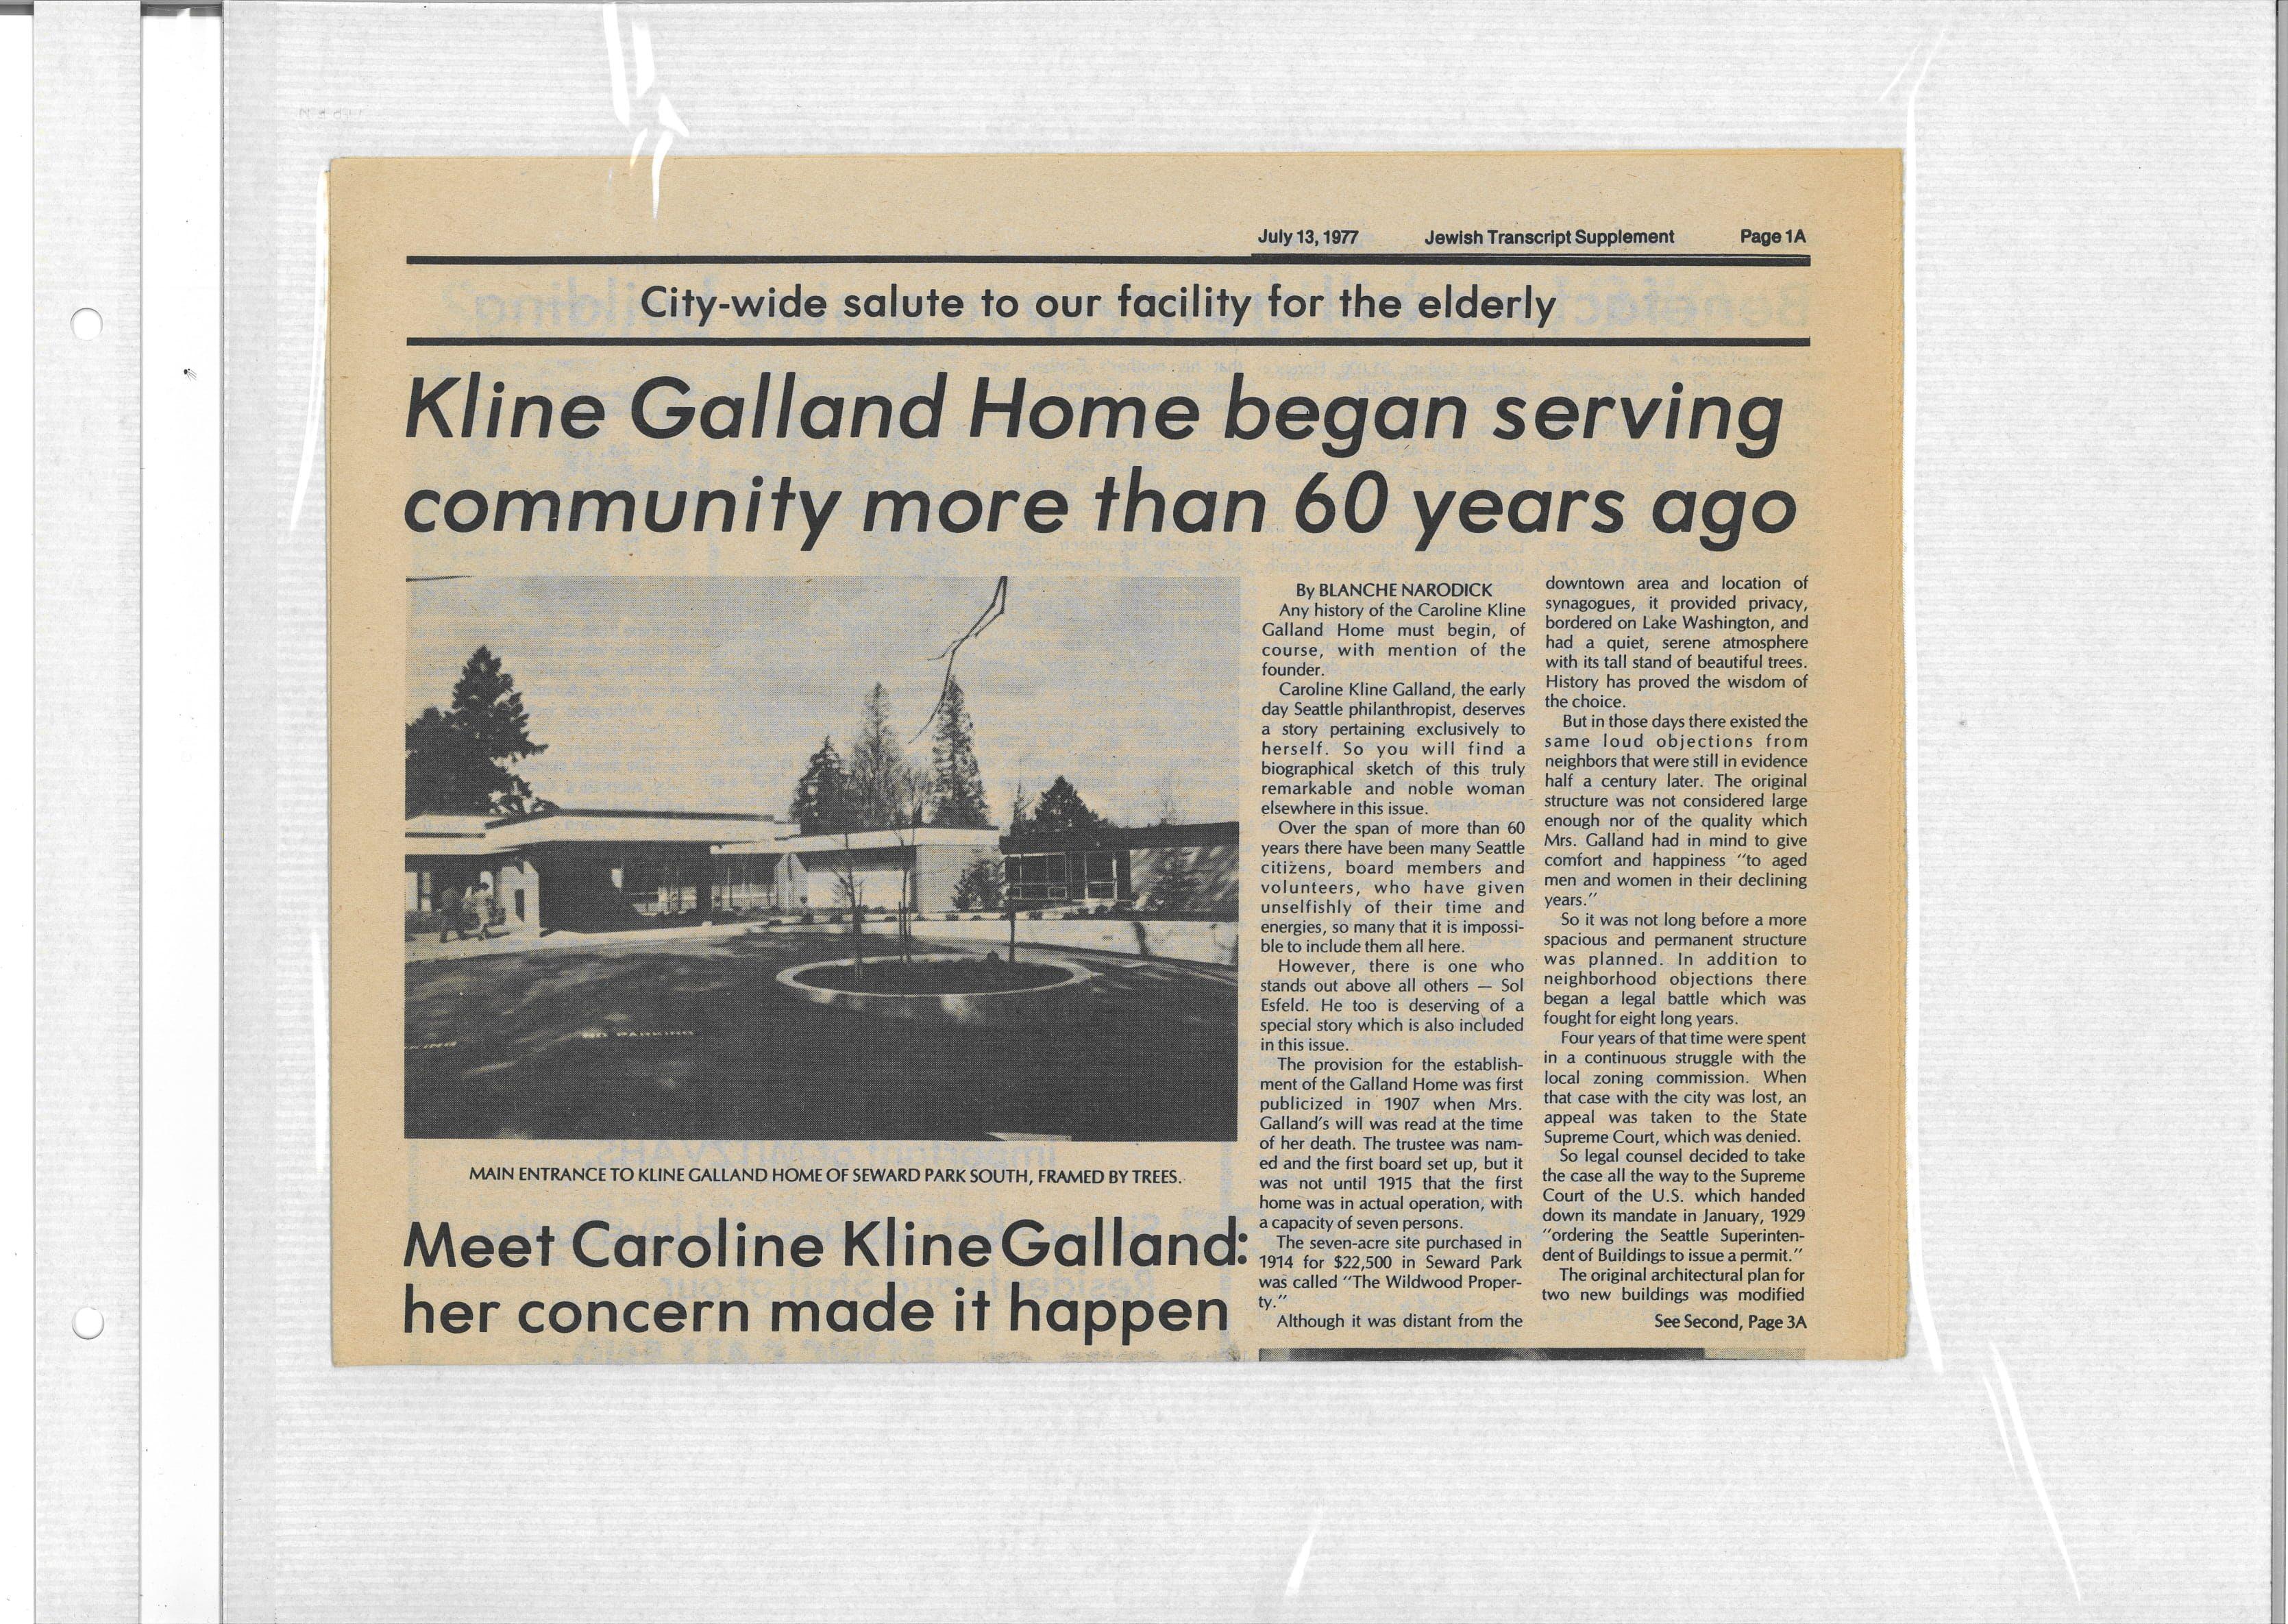 The sixtieth anniversary of Kline Galland (July 13, 1977)